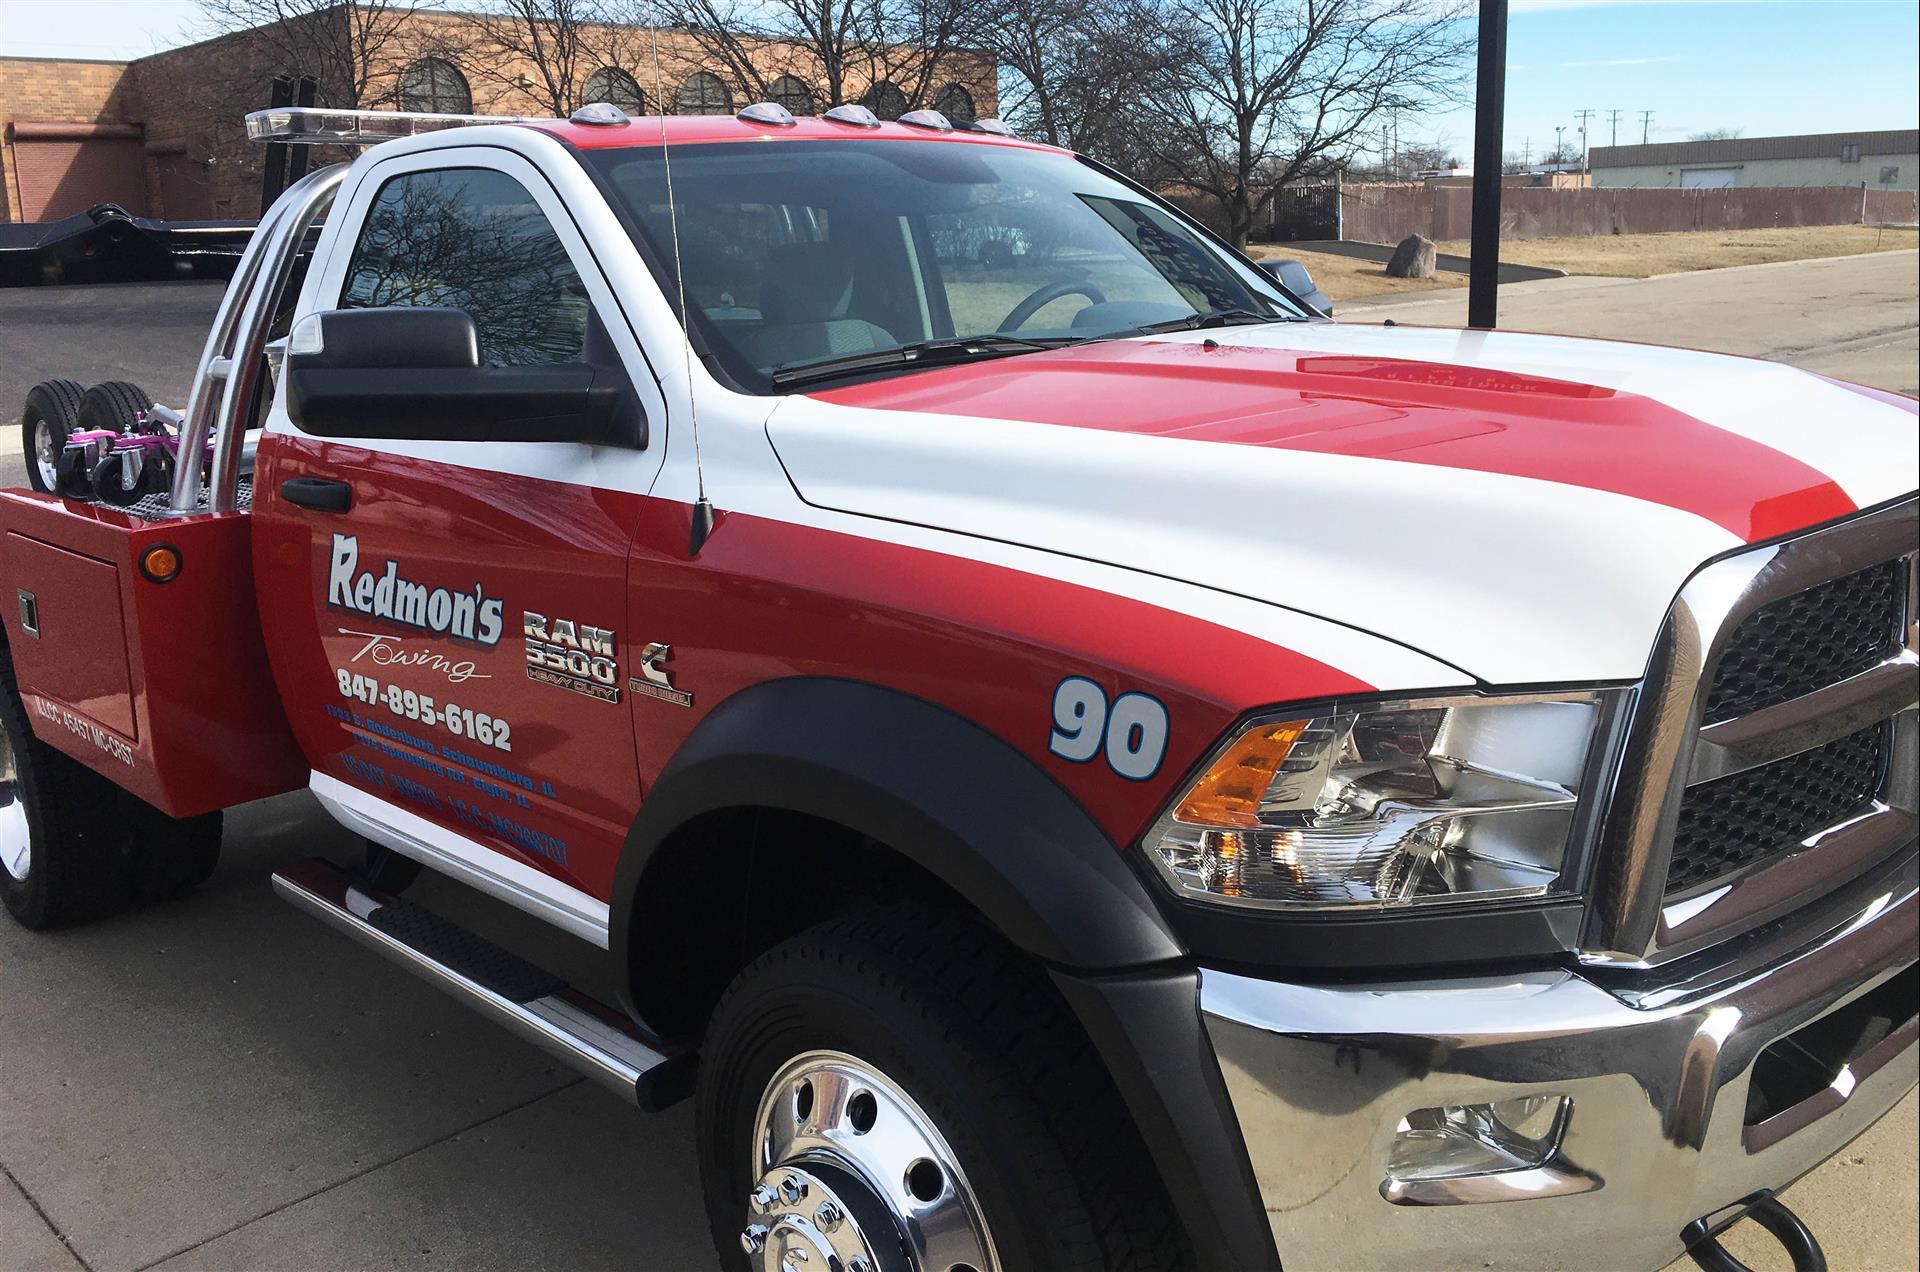 Redmon's Truck Wrap